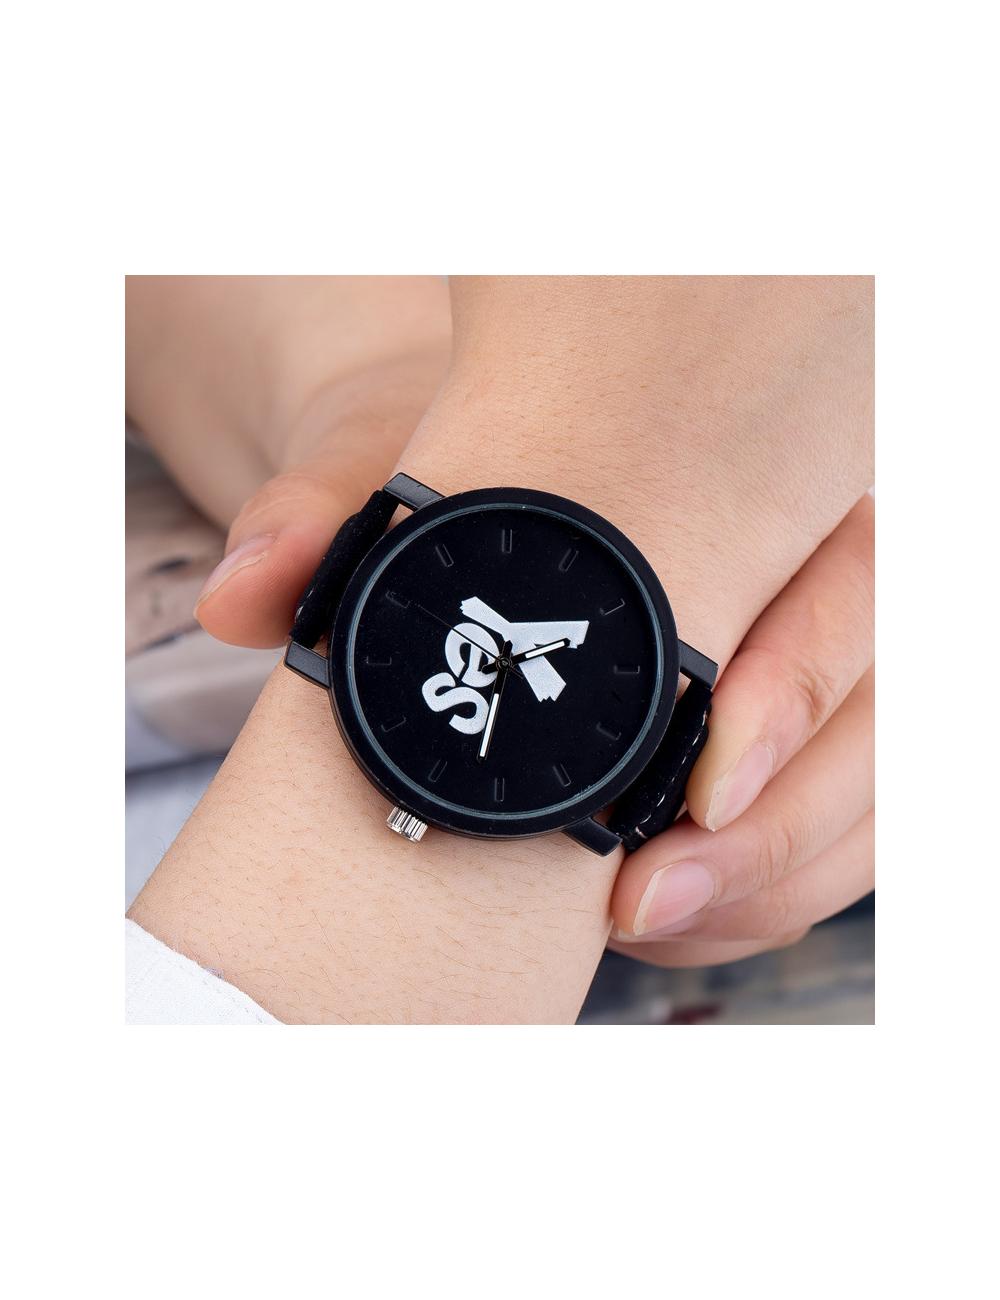 Reloj Yes Dayoshop 33,900.00